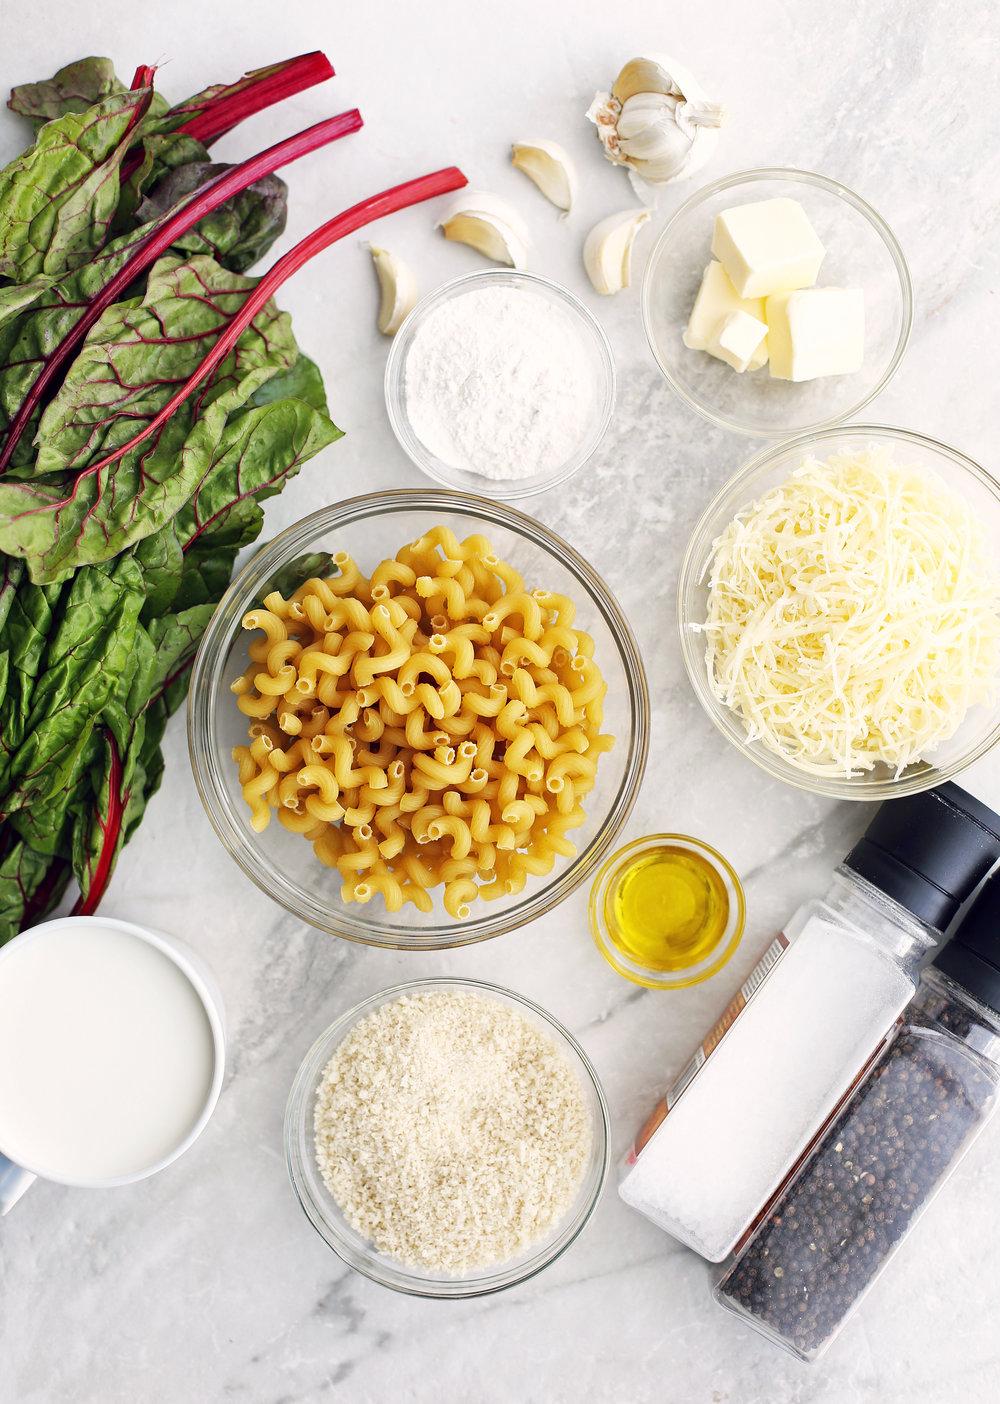 panko-swiss-chard-gruyere-pasta-ingredients.jpg